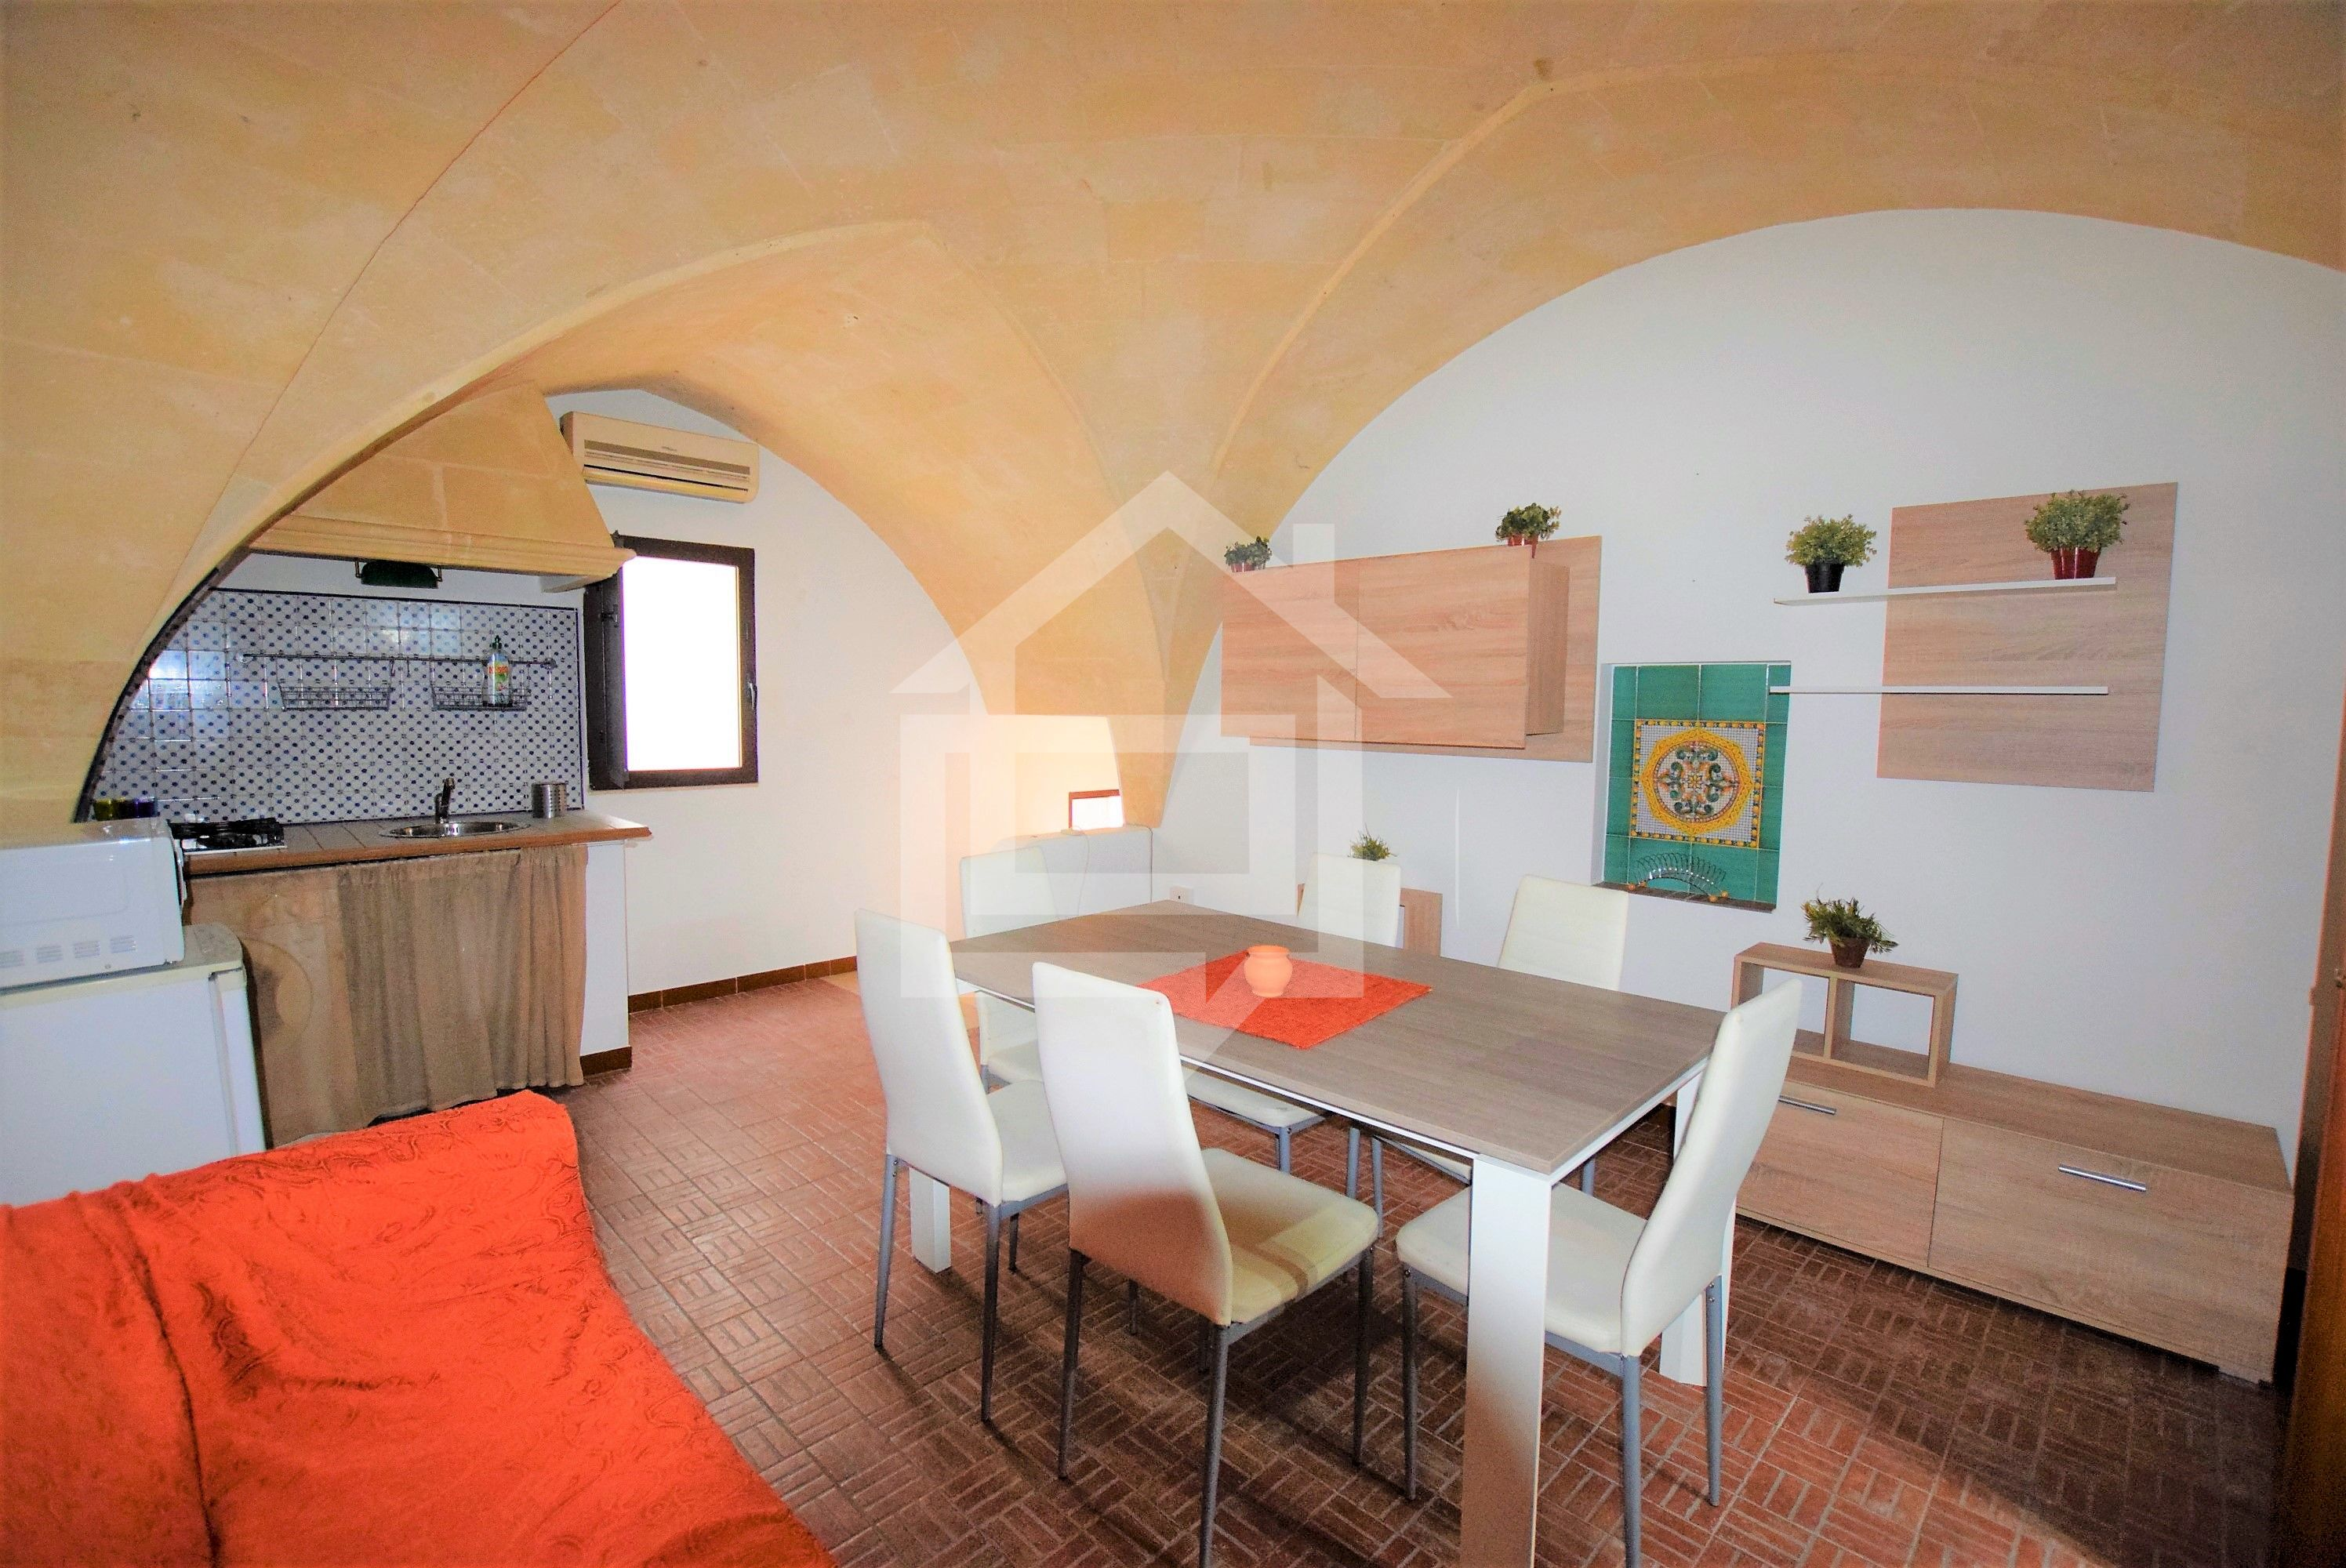 Camera Matrimoniale A Grottaglie.Divicasa Appartamento In Vendita A Grottaglie Via Paisiello 27